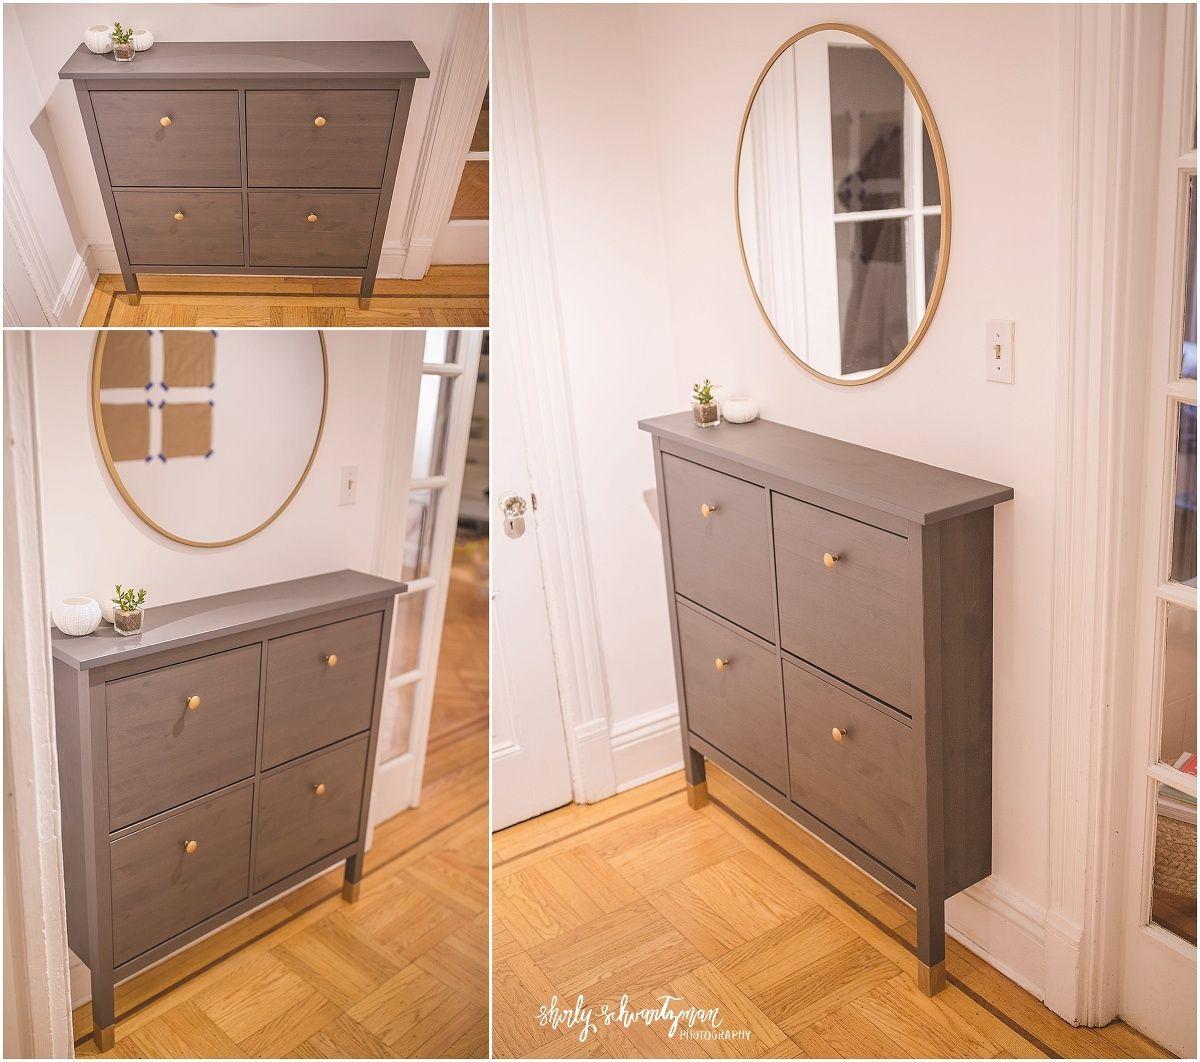 Ikea Nederland Interieur Online Bestellen Affordable Furniture Ikea Hemnes Cabinet Hemnes